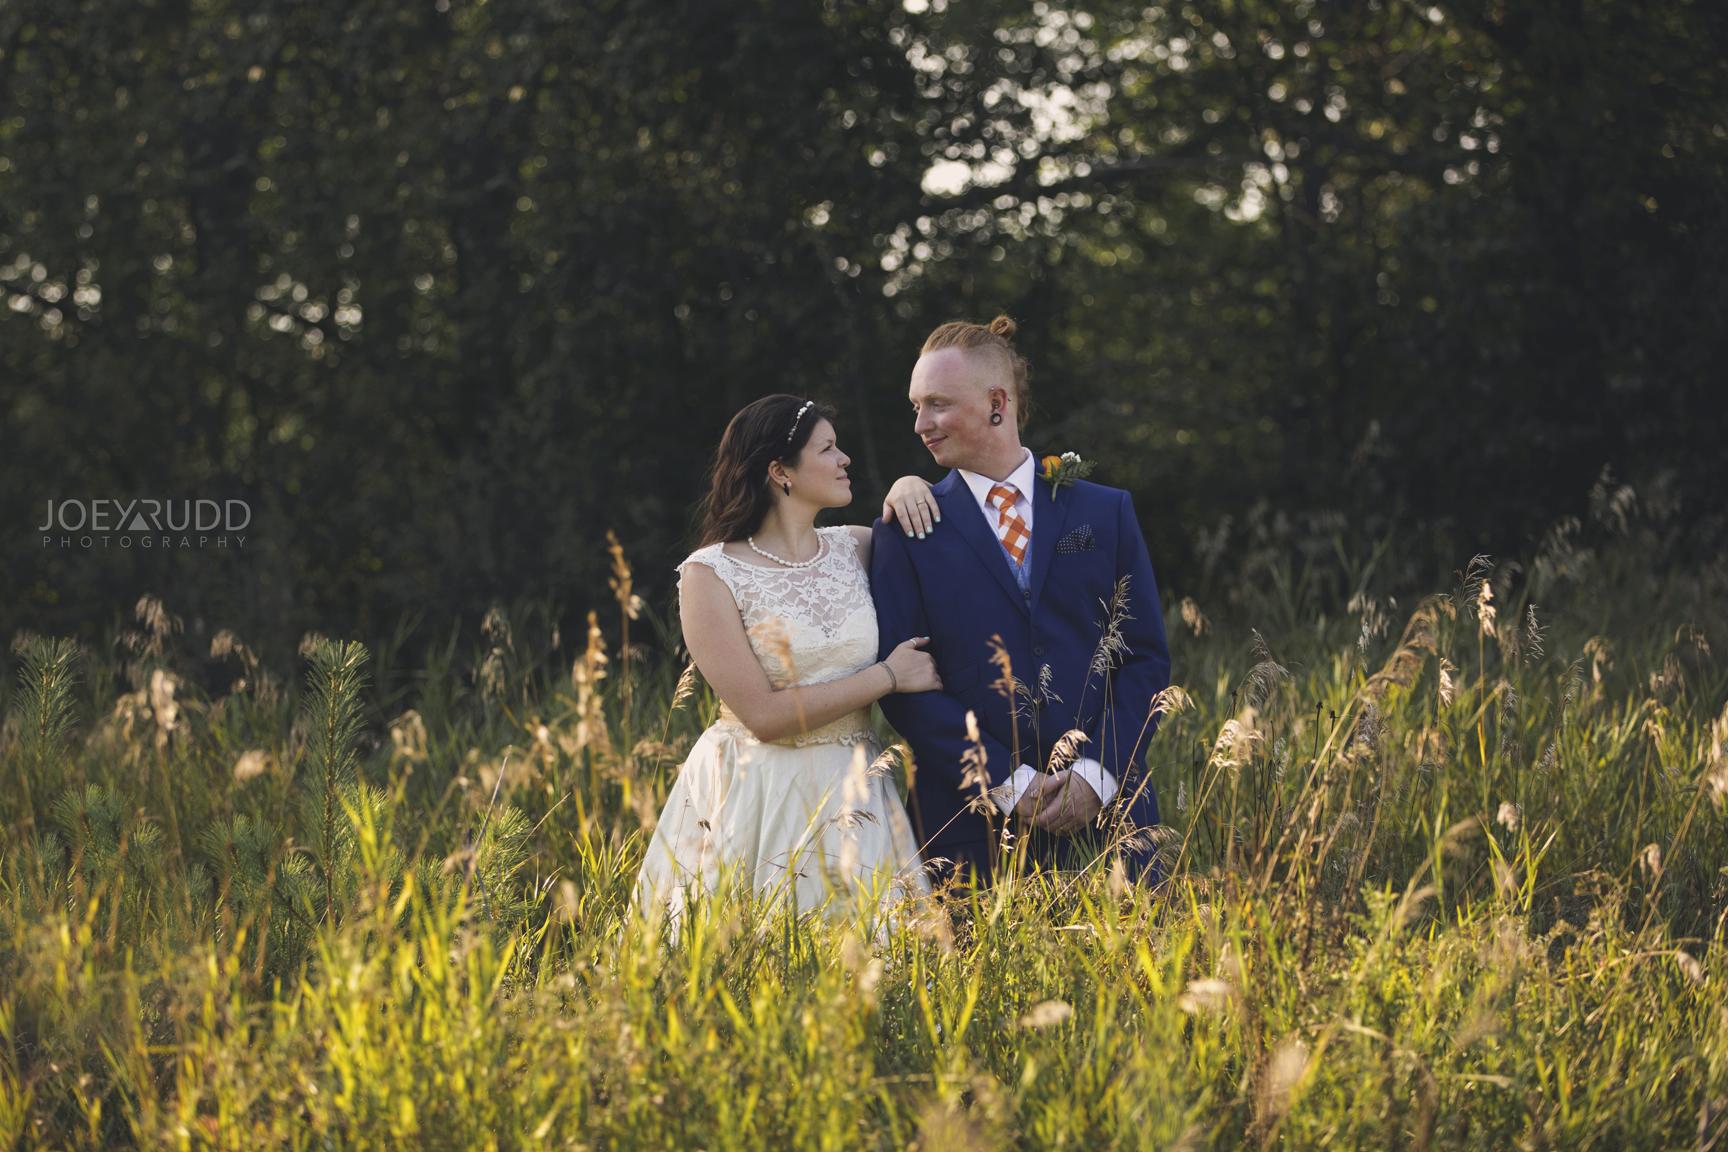 Backyard Kingston Wedding by Ottawa Wedding Photographer Joey Rudd Photography Field